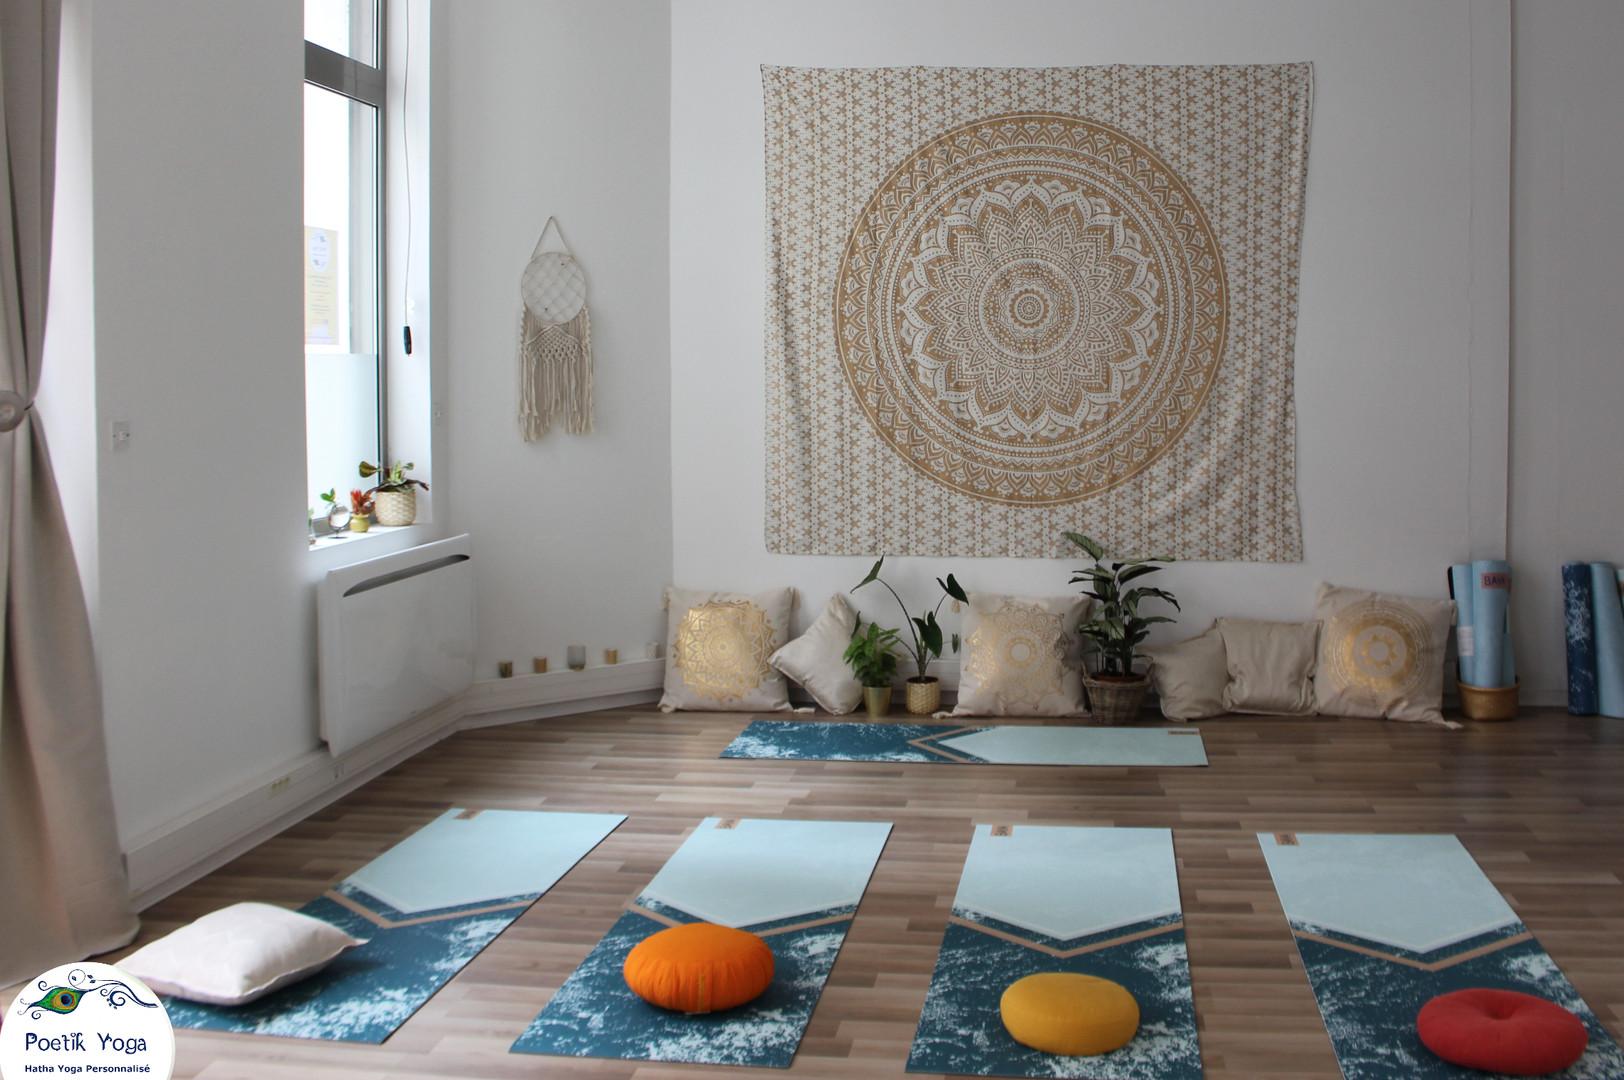 Poetik Yoga Studio Lille